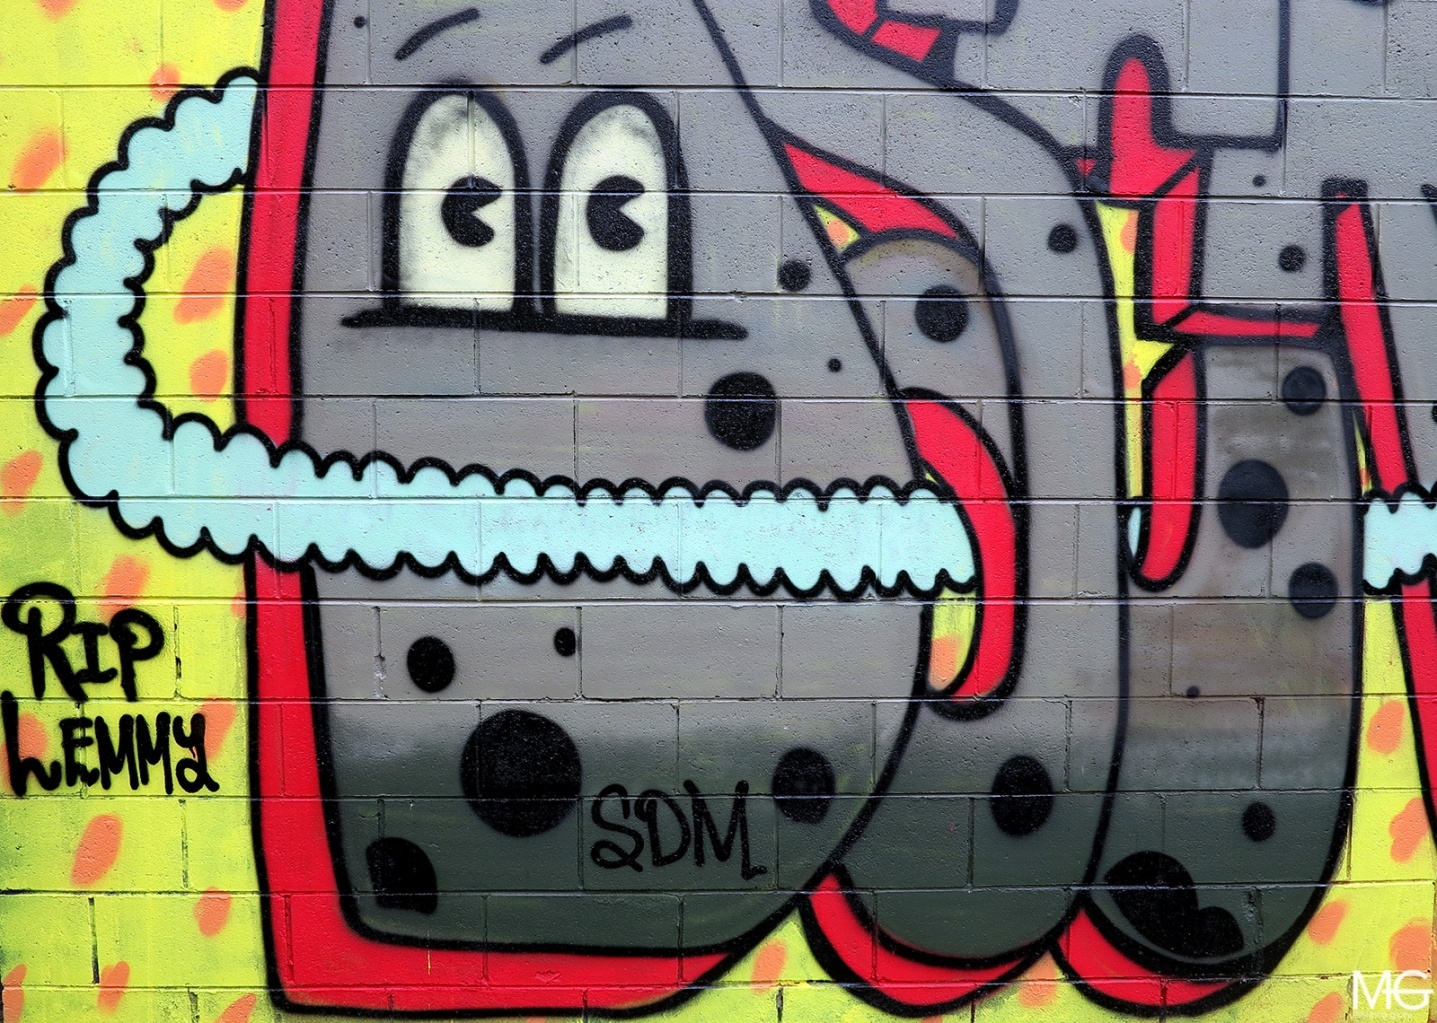 Dscreet-Rase-Ethics-Askem-Dvate-Brunswick-Graffiti-Morning-Glory-Melbourne2